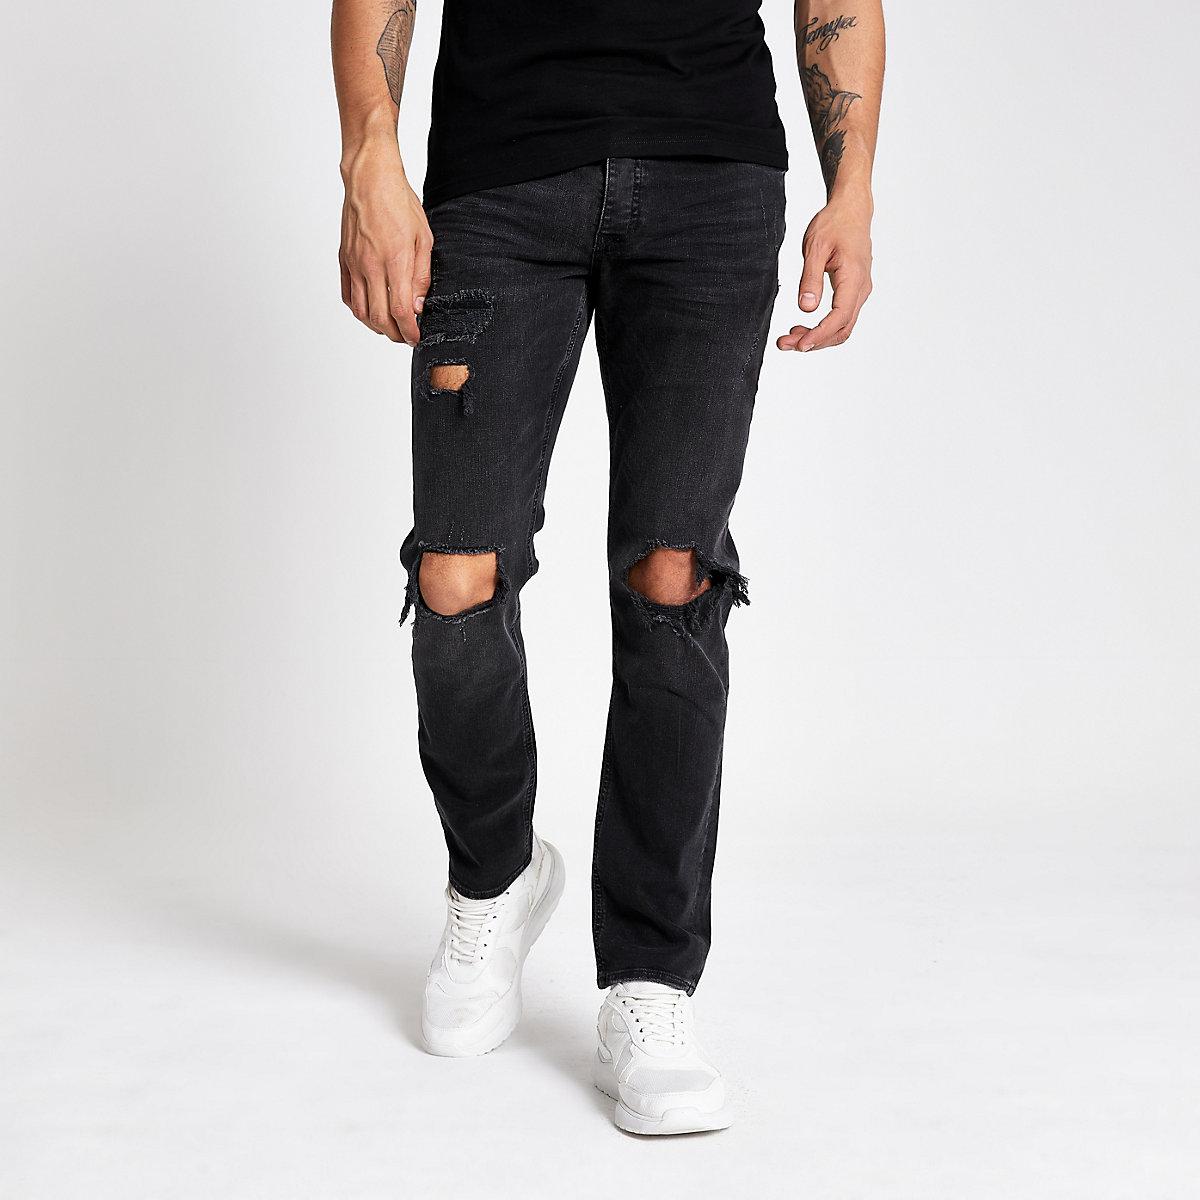 Dylan – Schwarze Slim Fit Jeans im Used Look